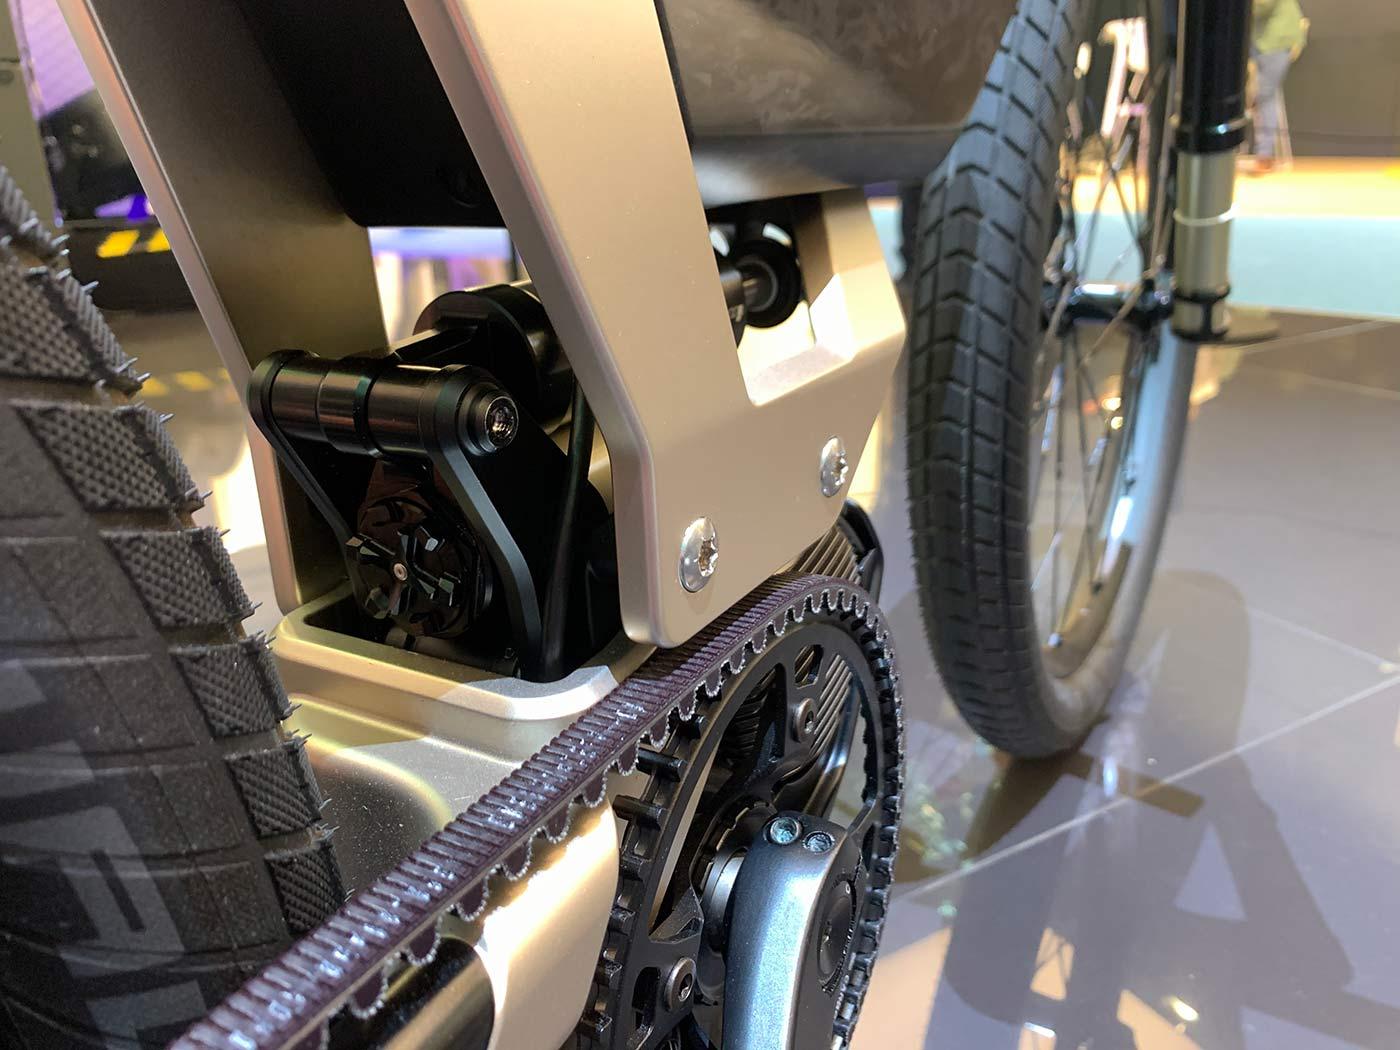 bmw concept e-bike motor and suspension closeup